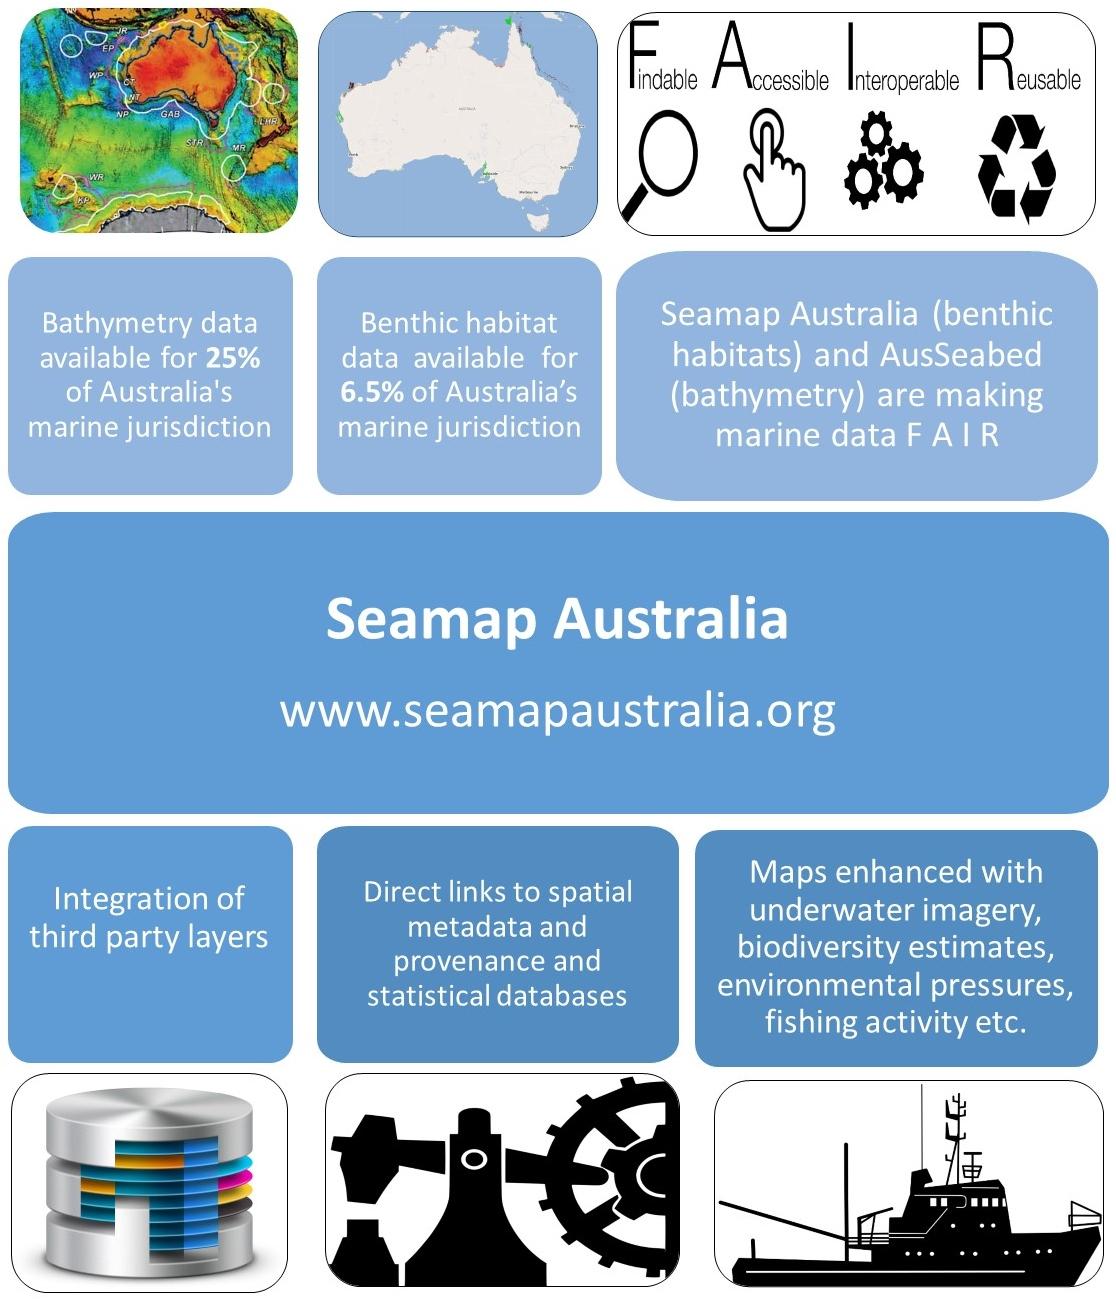 Seamap Australia integrates seafloor maps with various types of data, incorporating FAIR data principles.